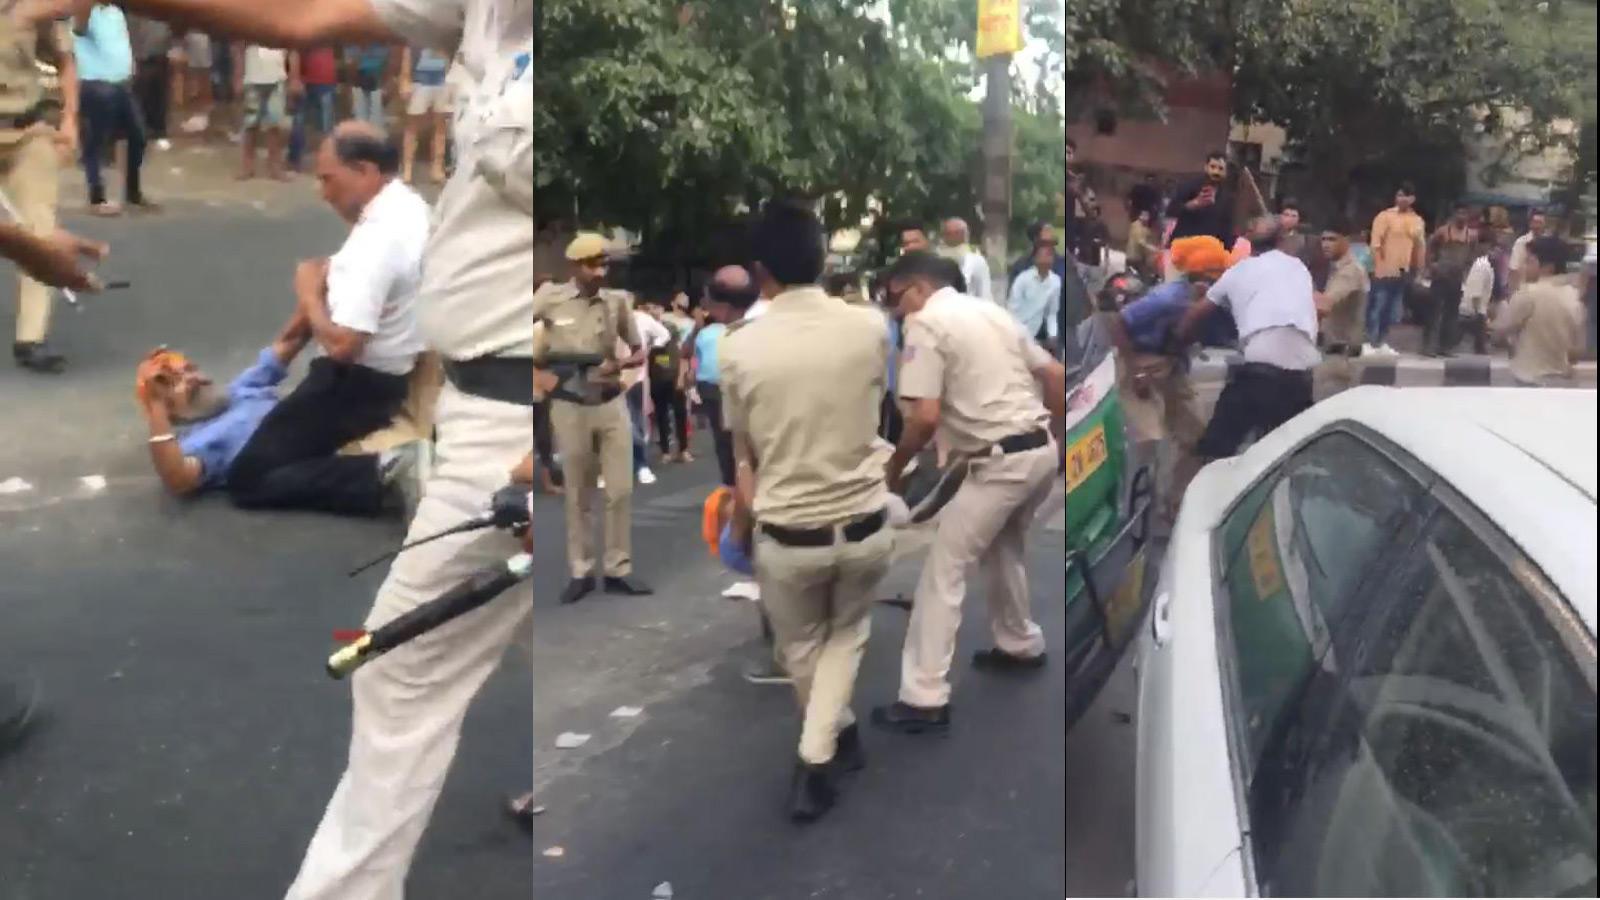 Cops clash with mini-bus driver in north Delhi's Mukherjee Nagar